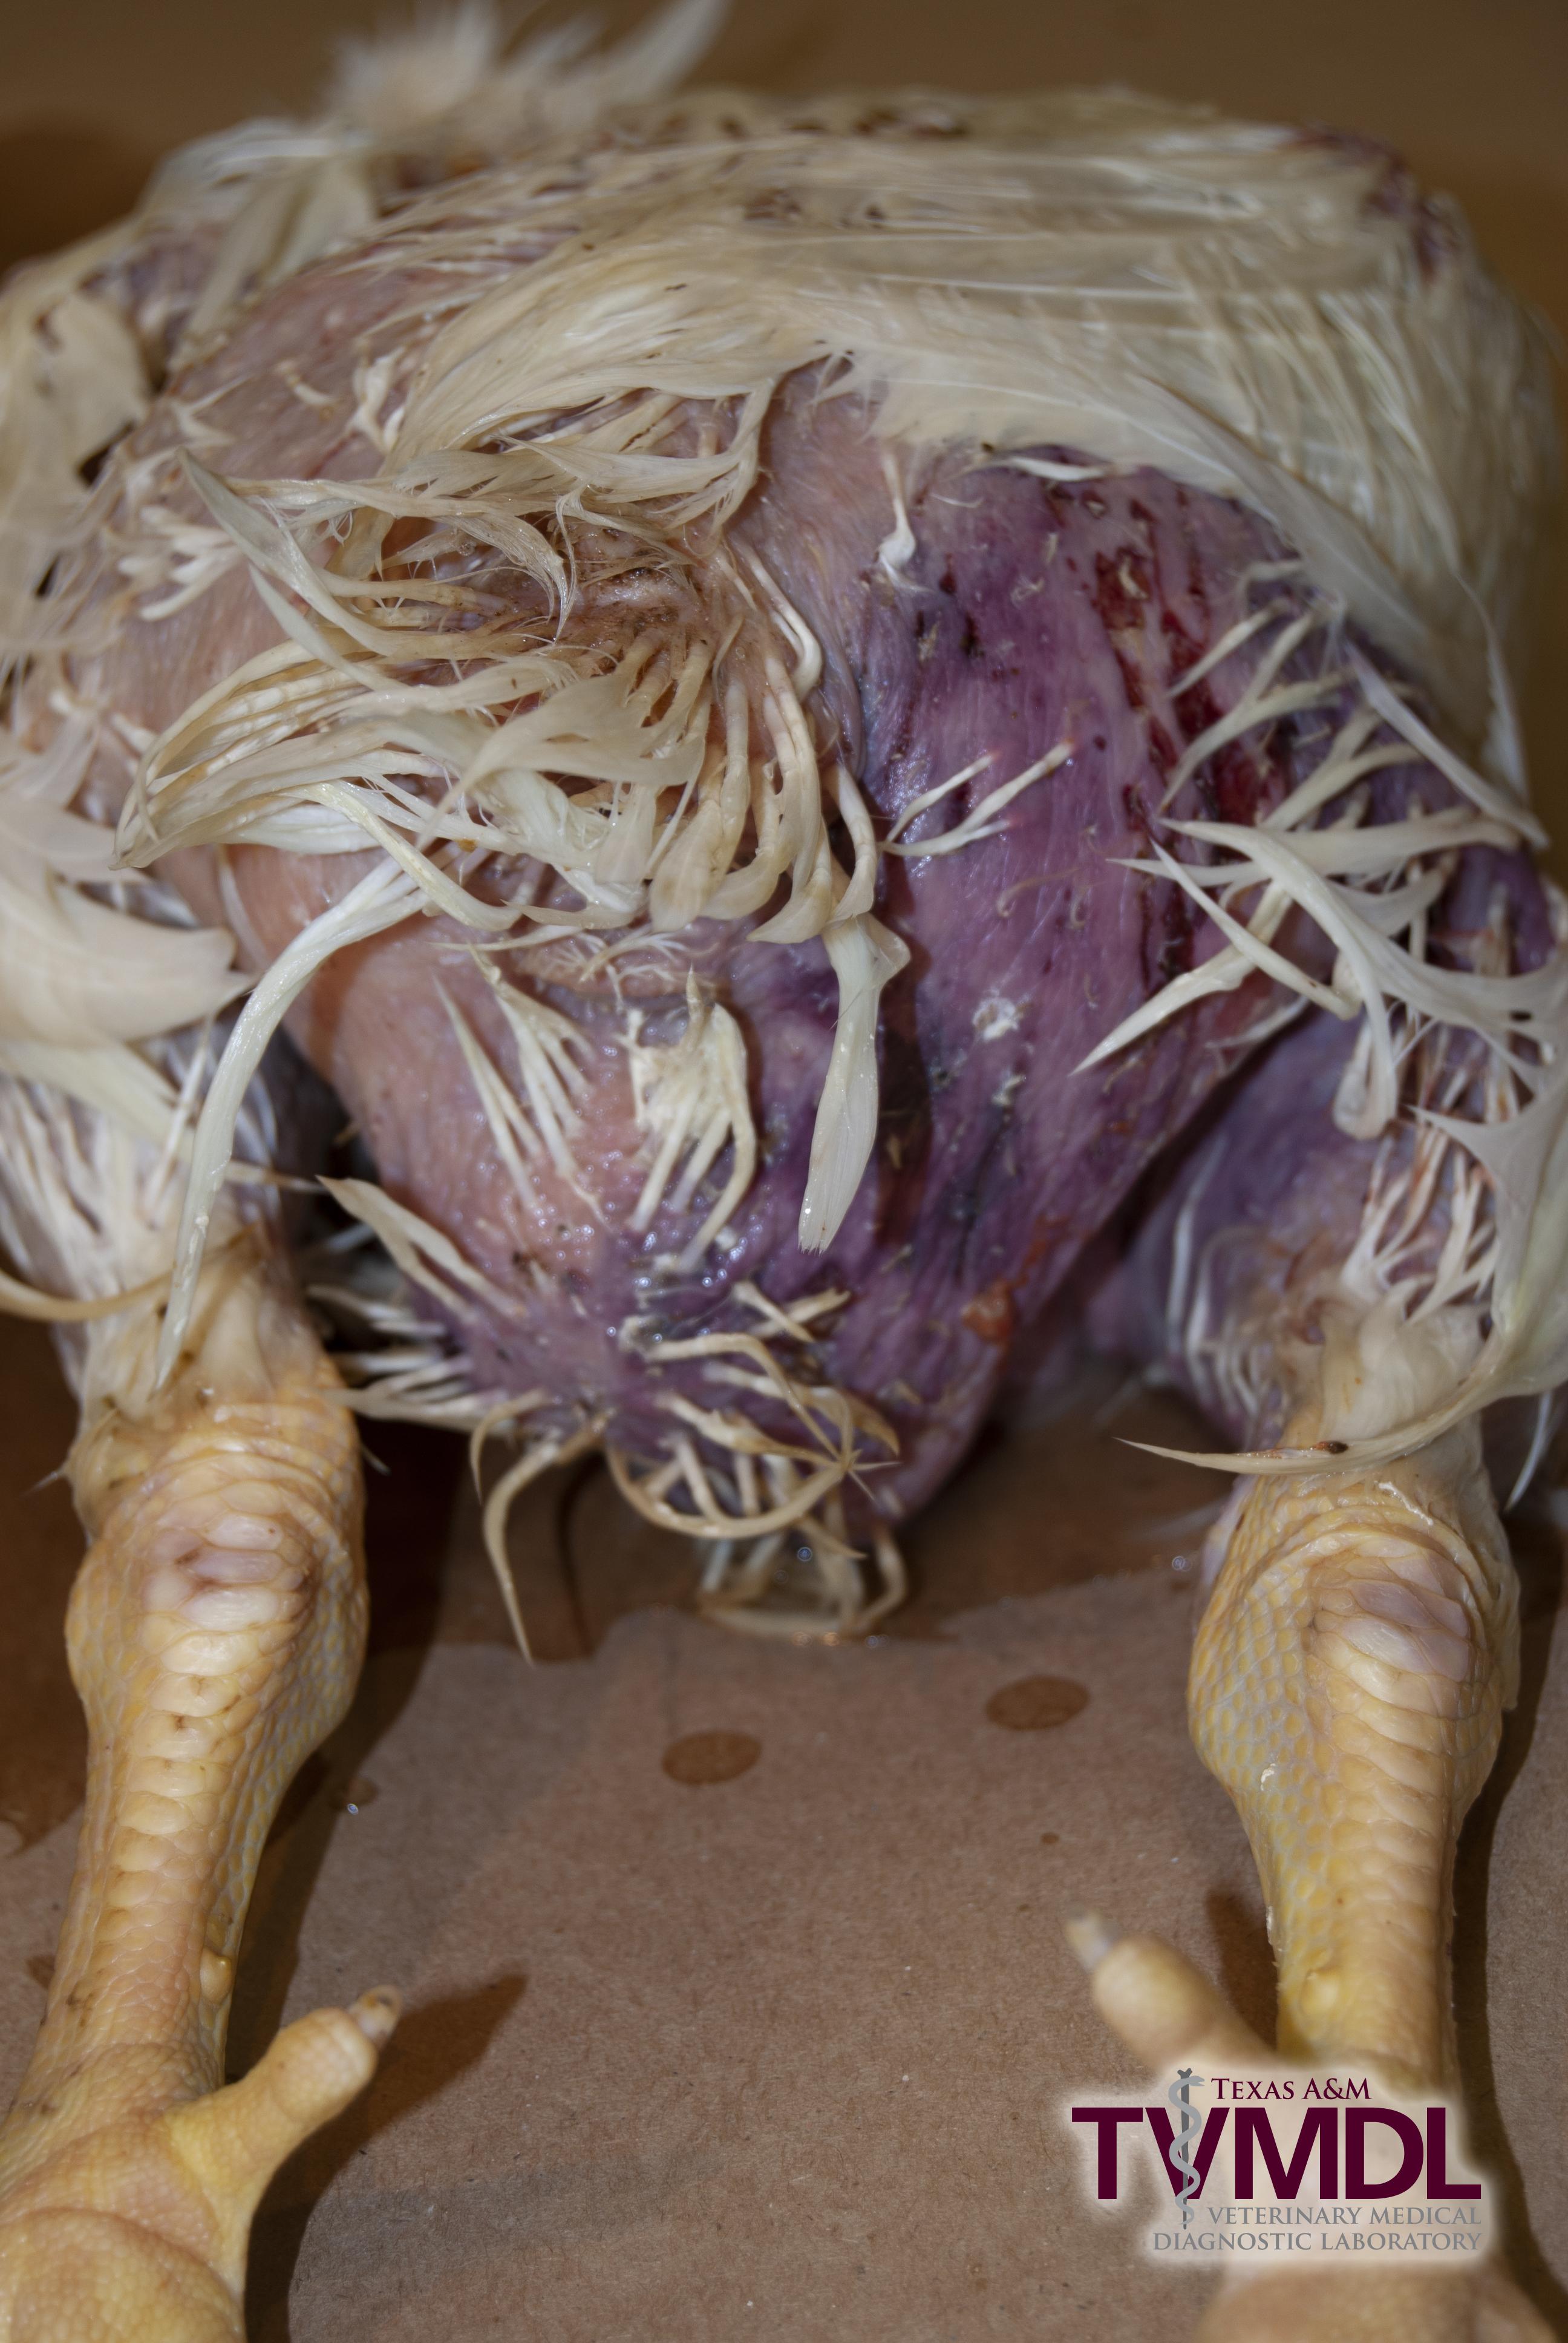 CREDIT: Texas A&M Veterinary Medical Diagnostic Laboratory - Avian Cases